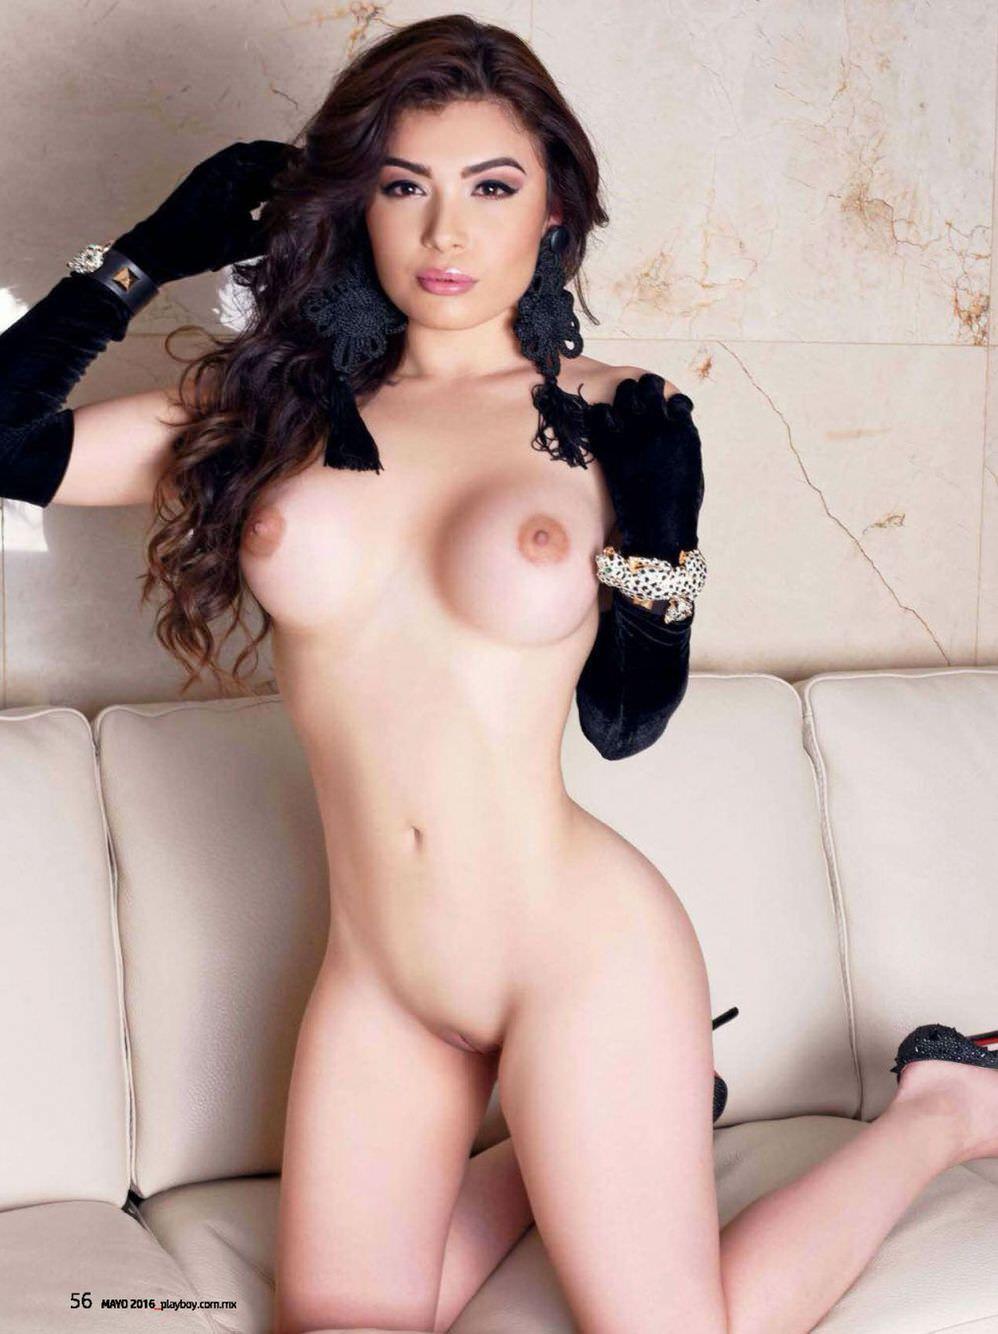 tracy saenz nude